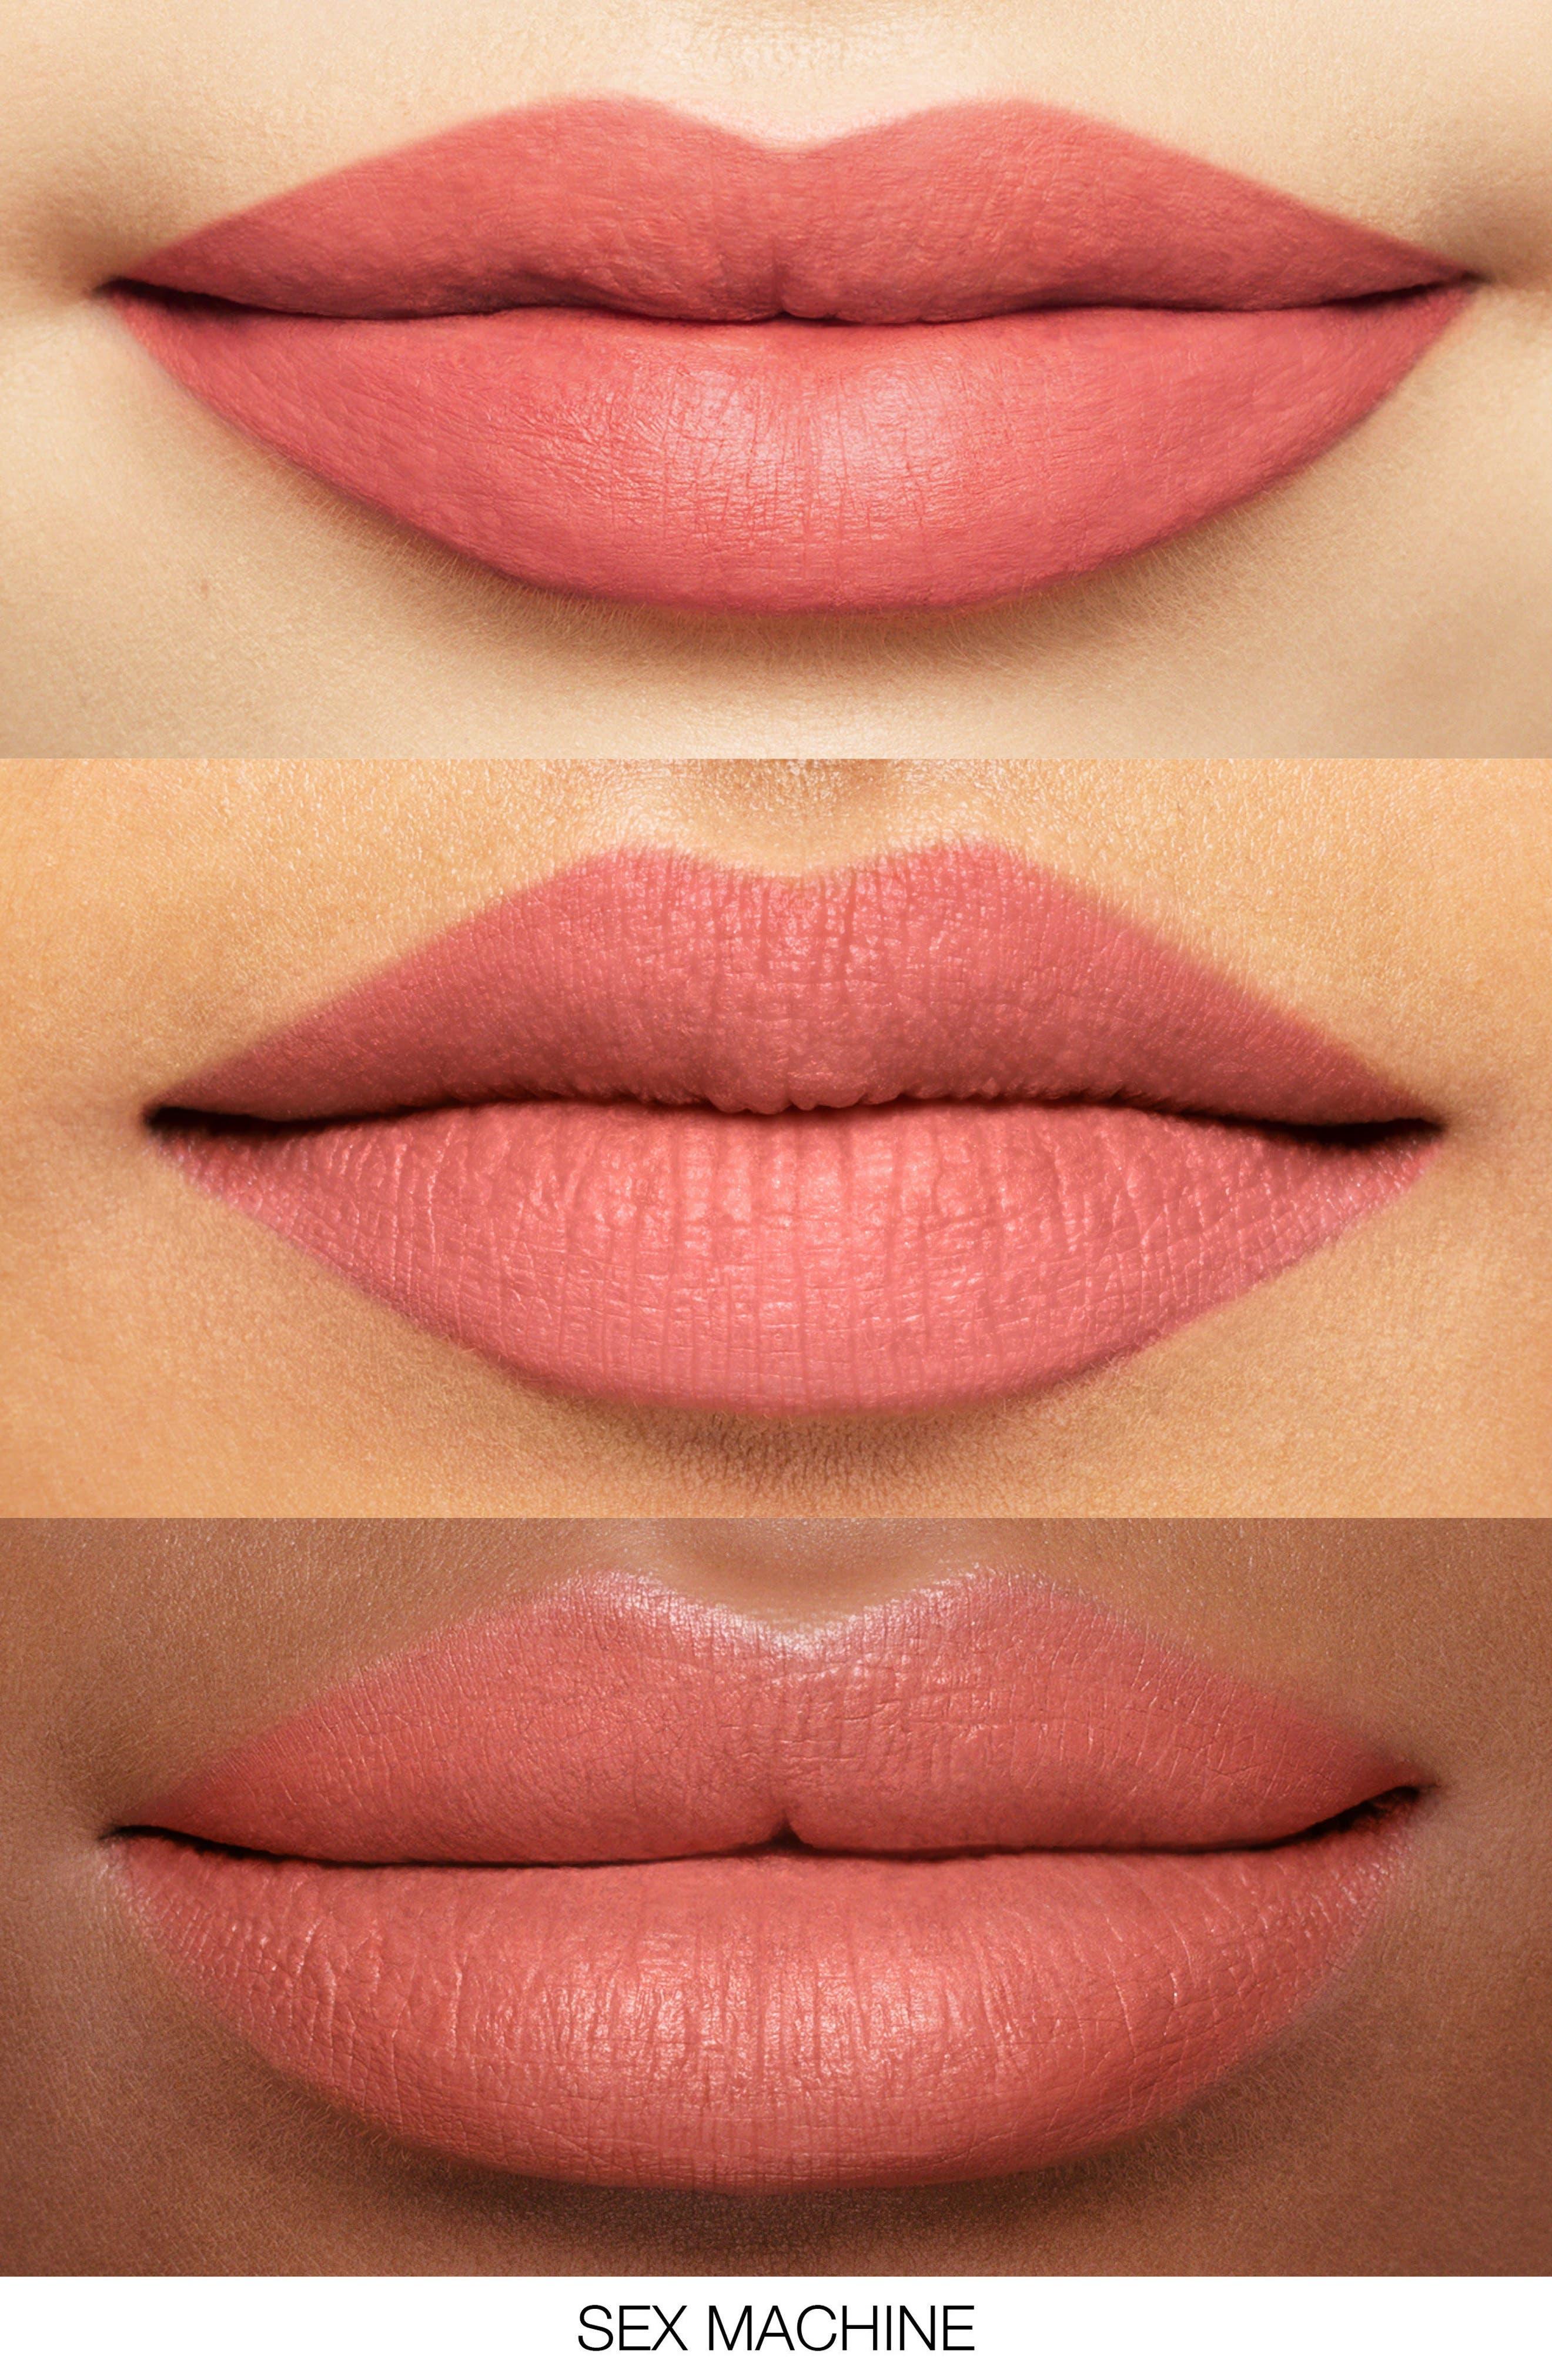 Embrayage Déclaration - Bouche Rubino Lèvres Rouges Par Tony Rubino Rubino Tony lvZqTU